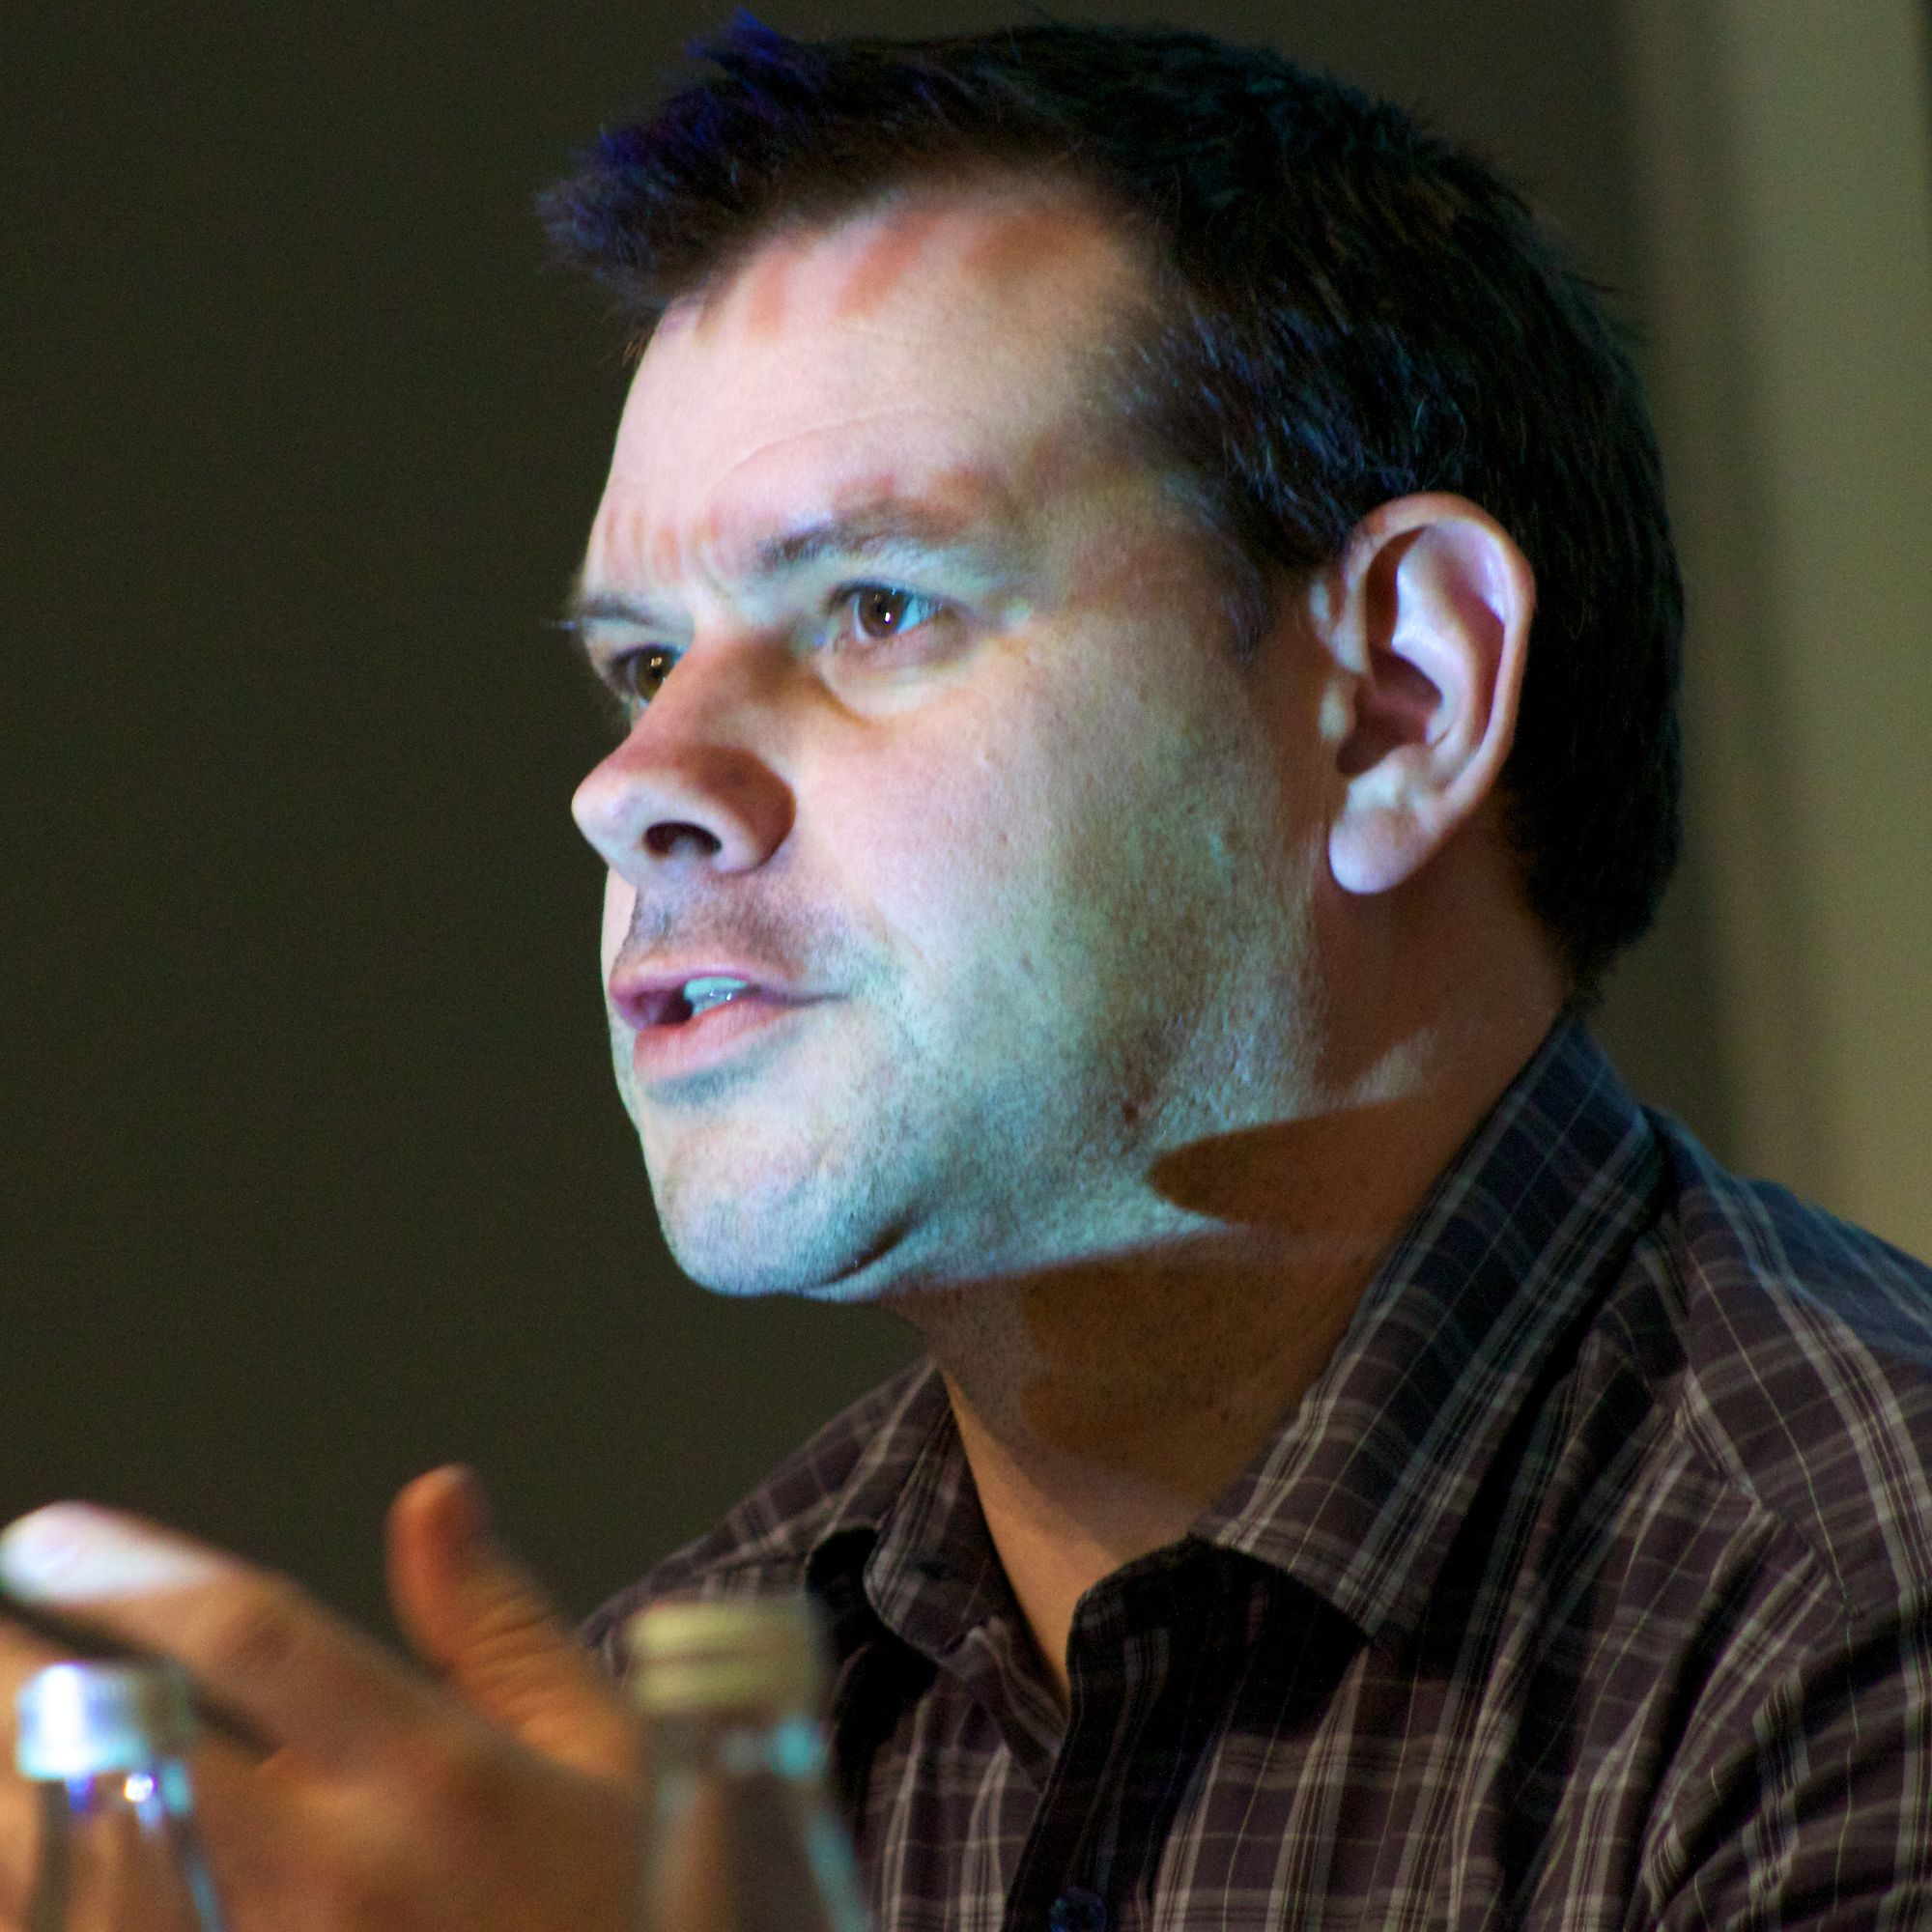 Martin Belam at news:rewired